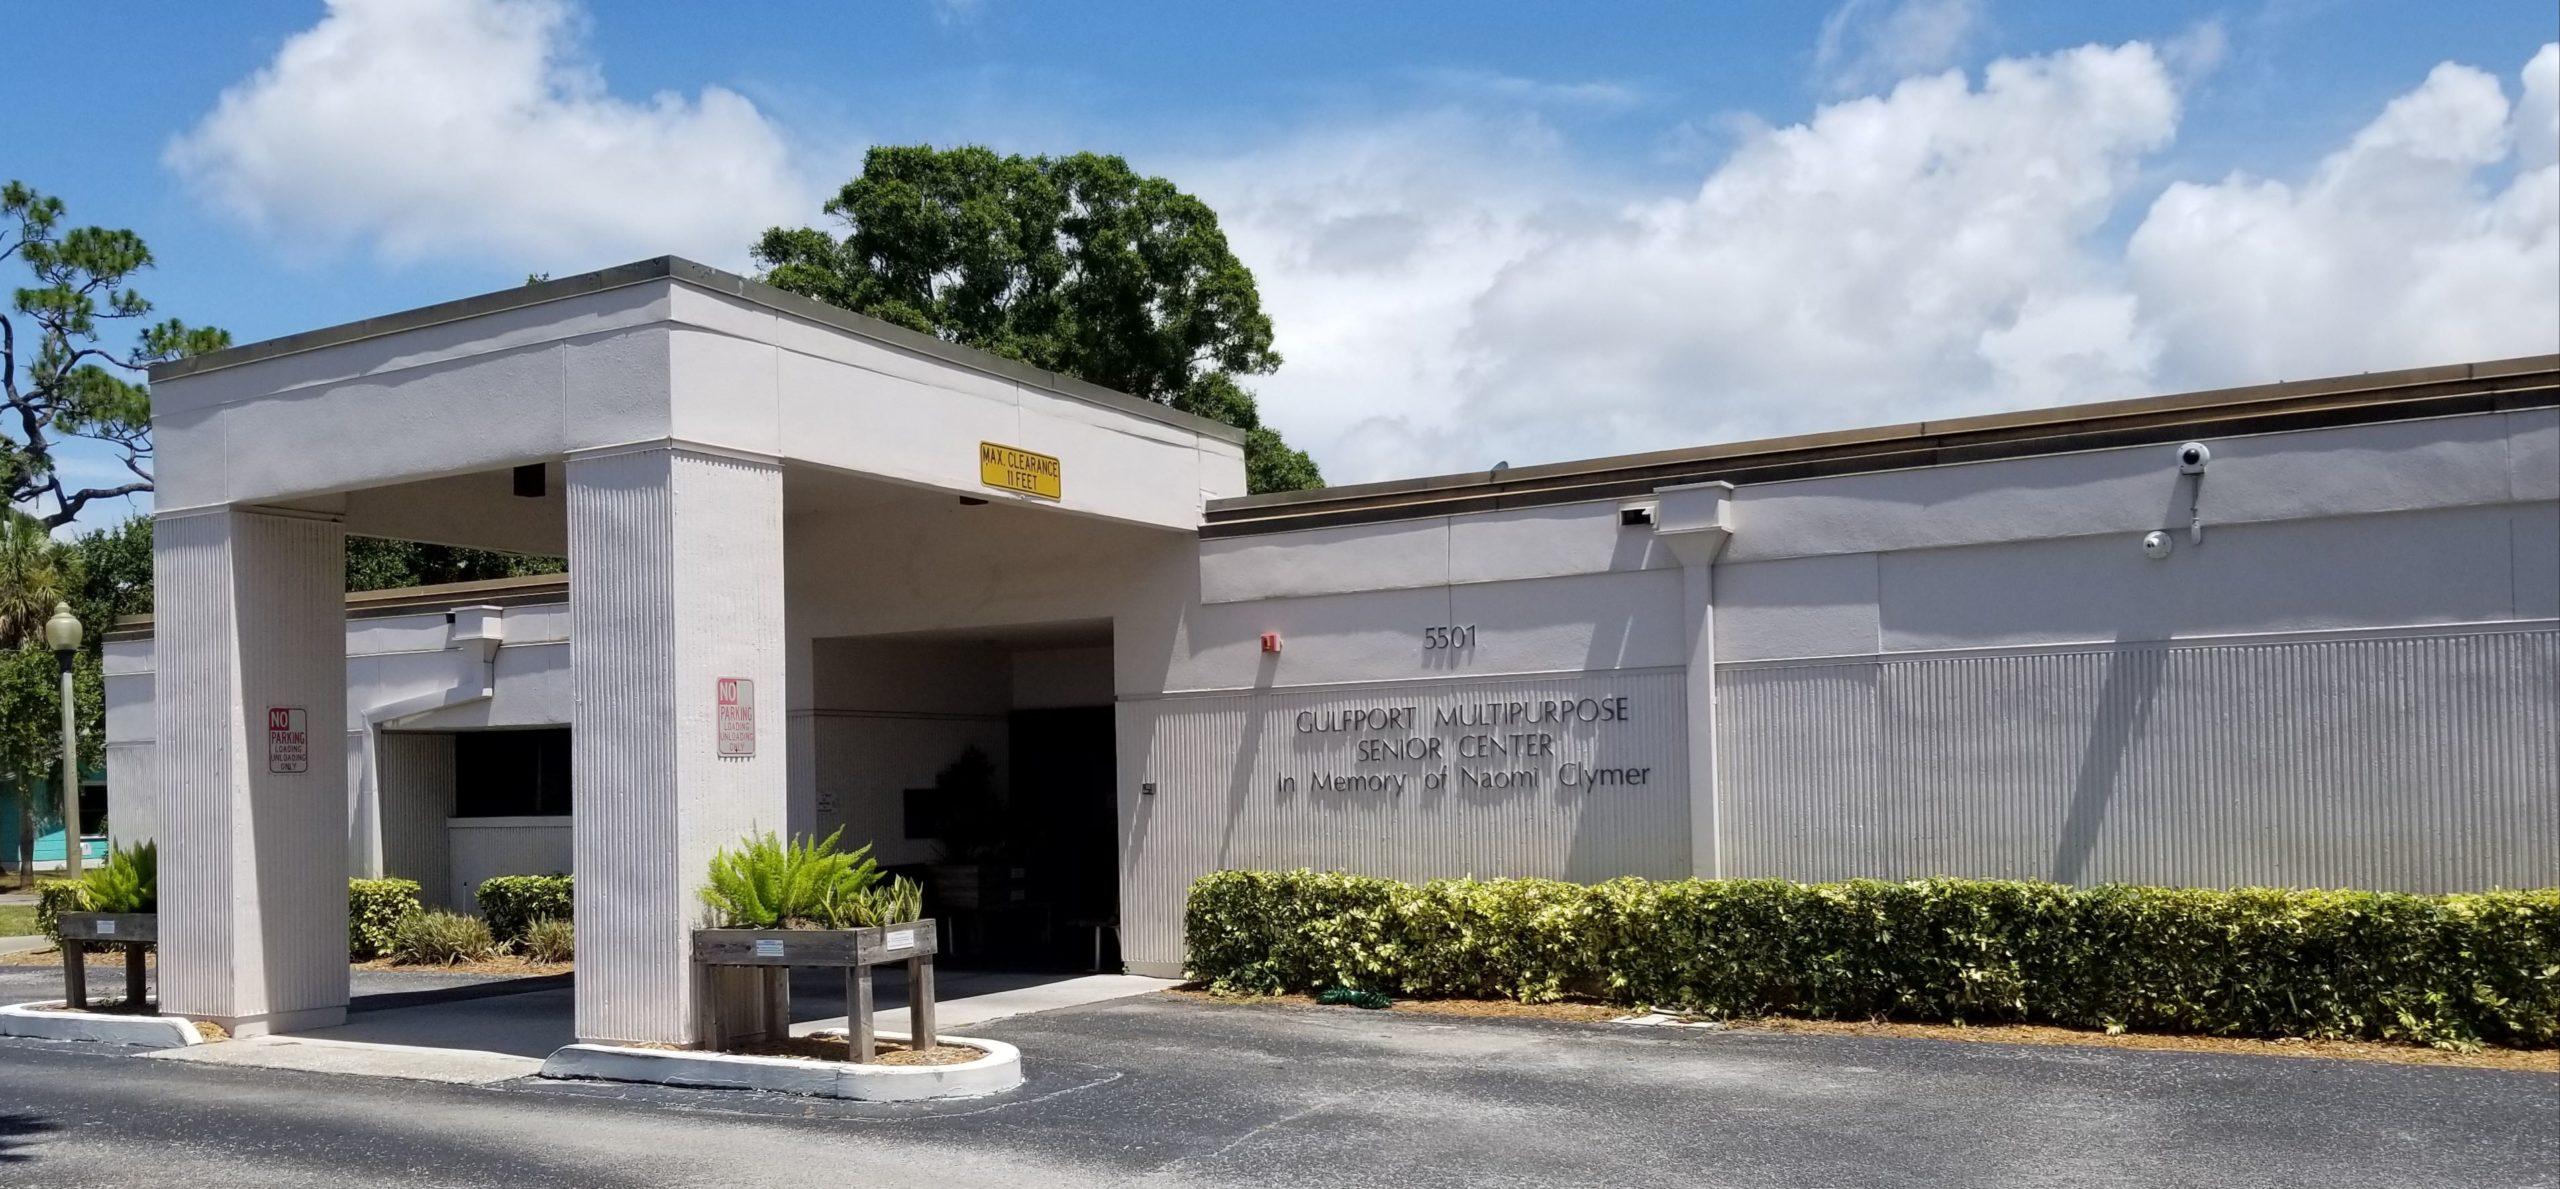 Entrance to the Gulfport Multipurpose Senior Center in Florida.